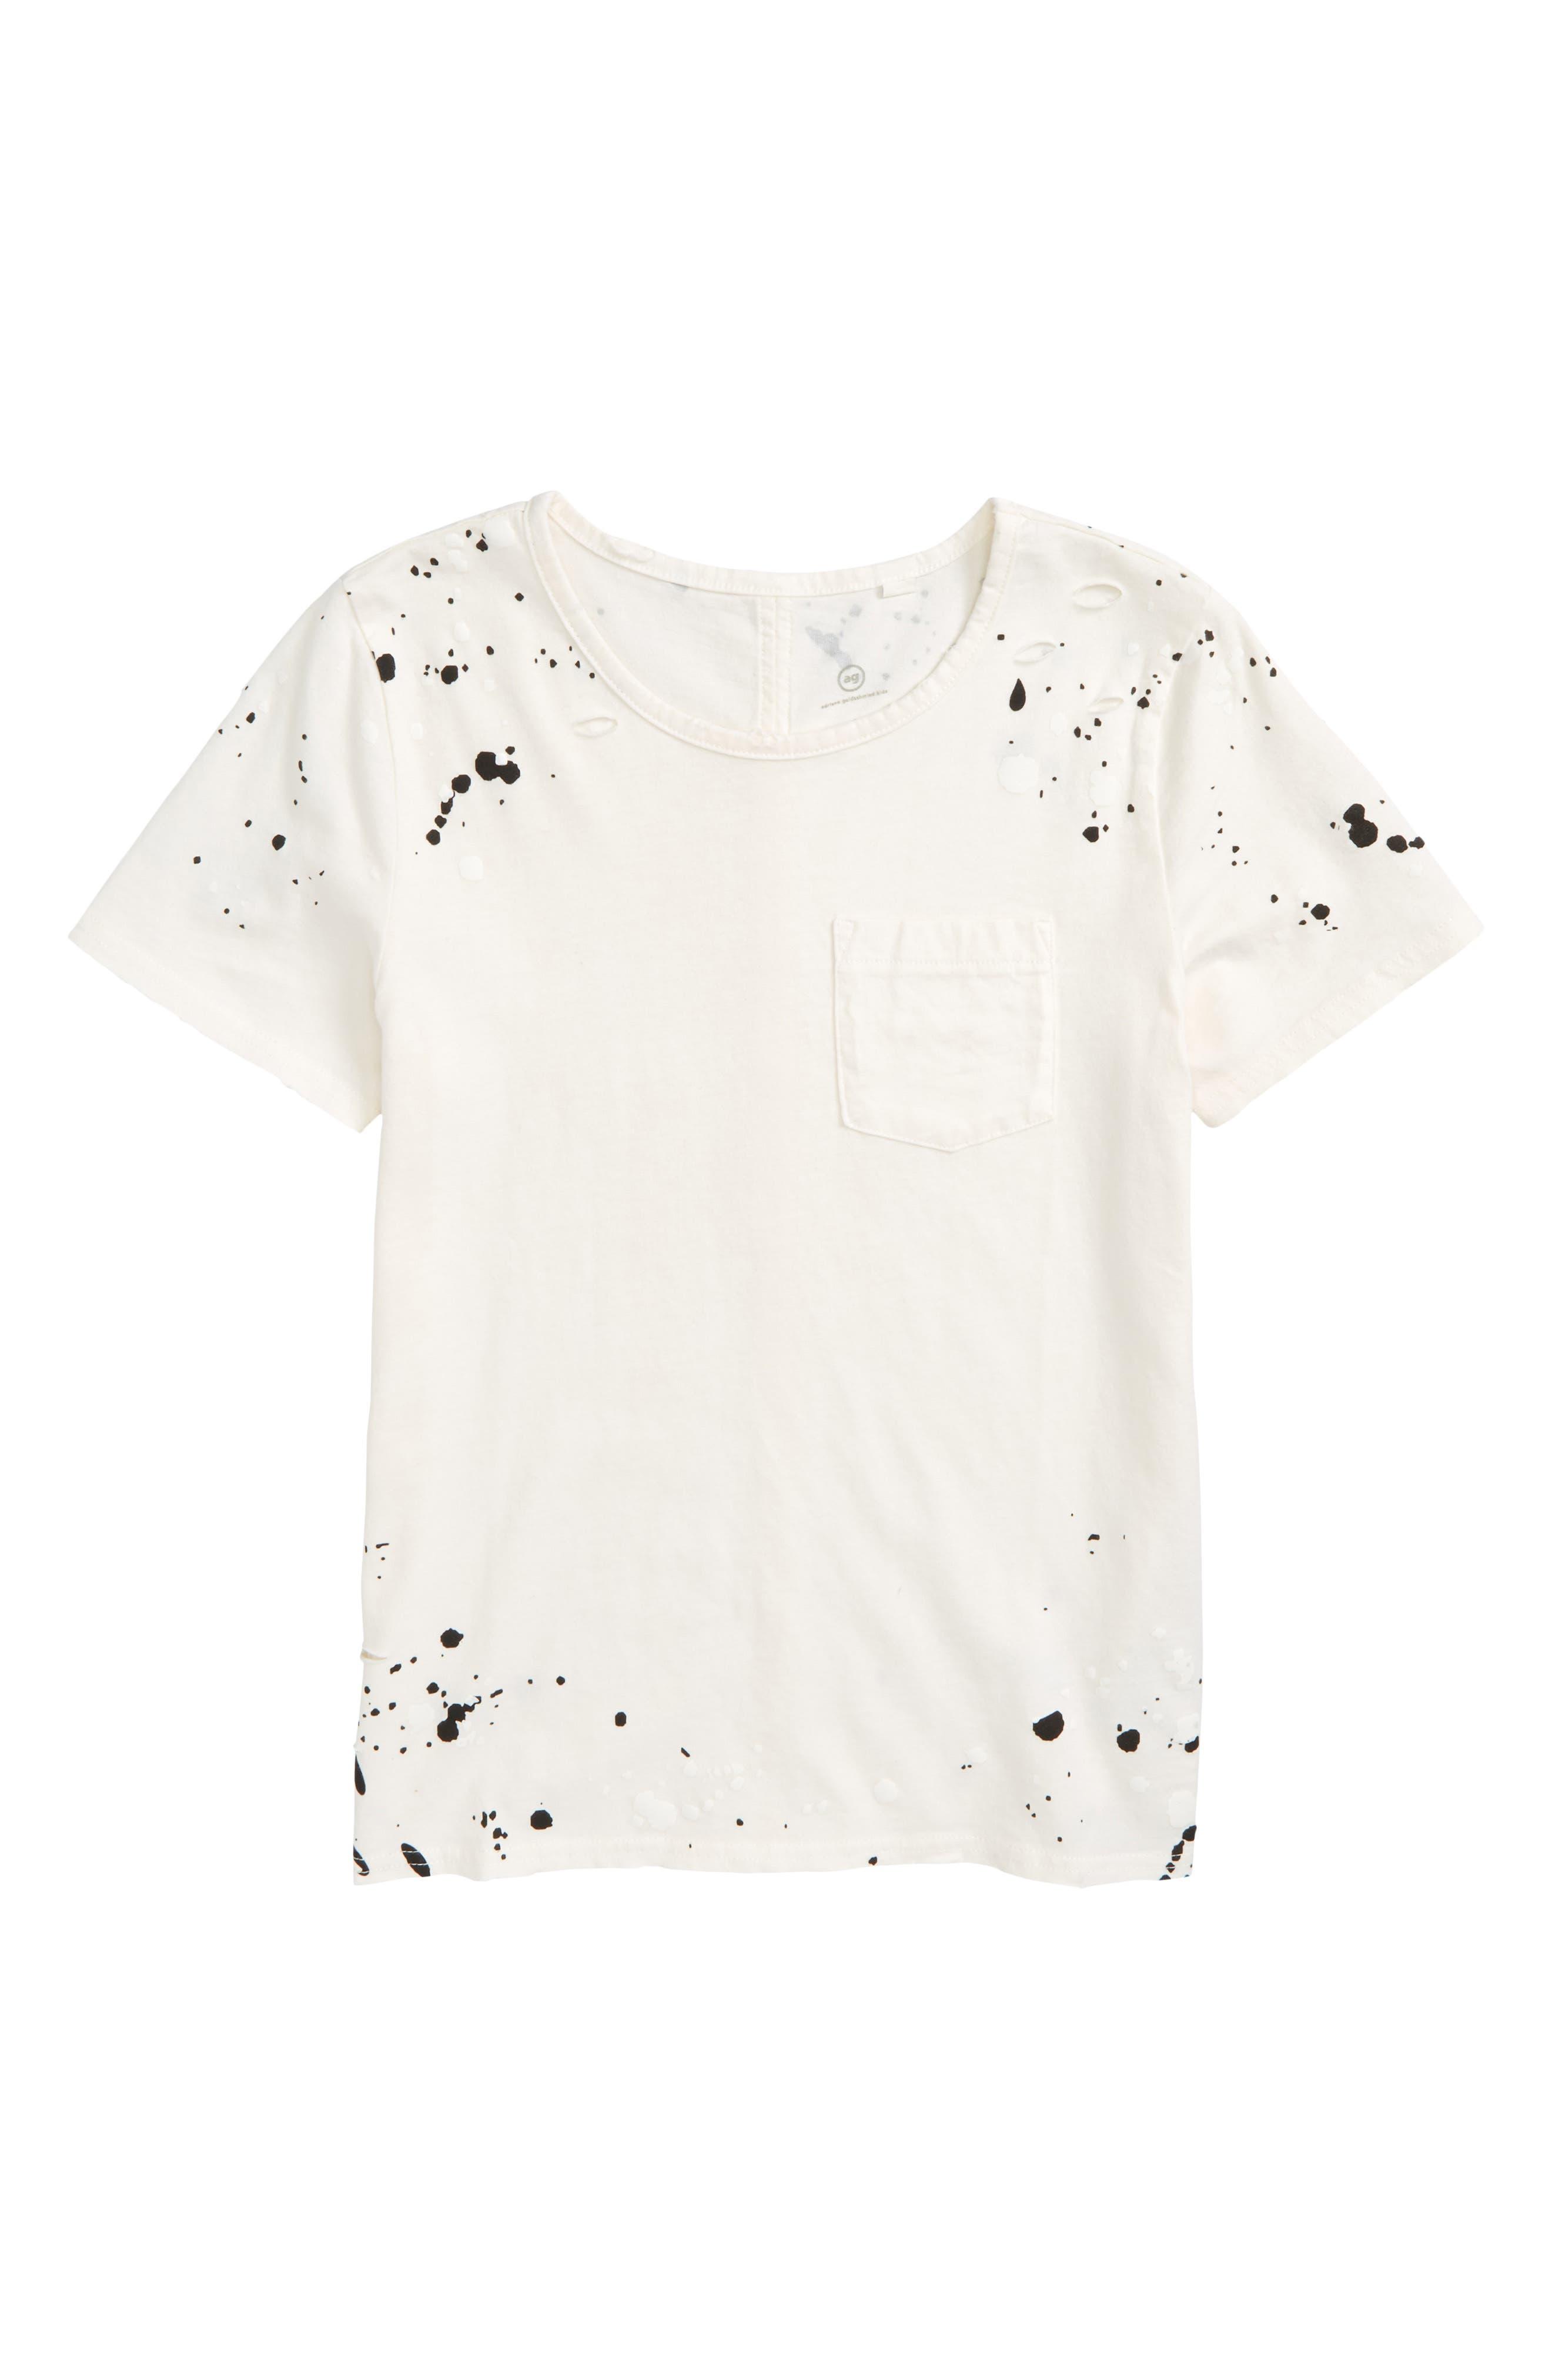 Waverly Paint Splatter Tee,                             Main thumbnail 1, color,                             Bleach White/ Black